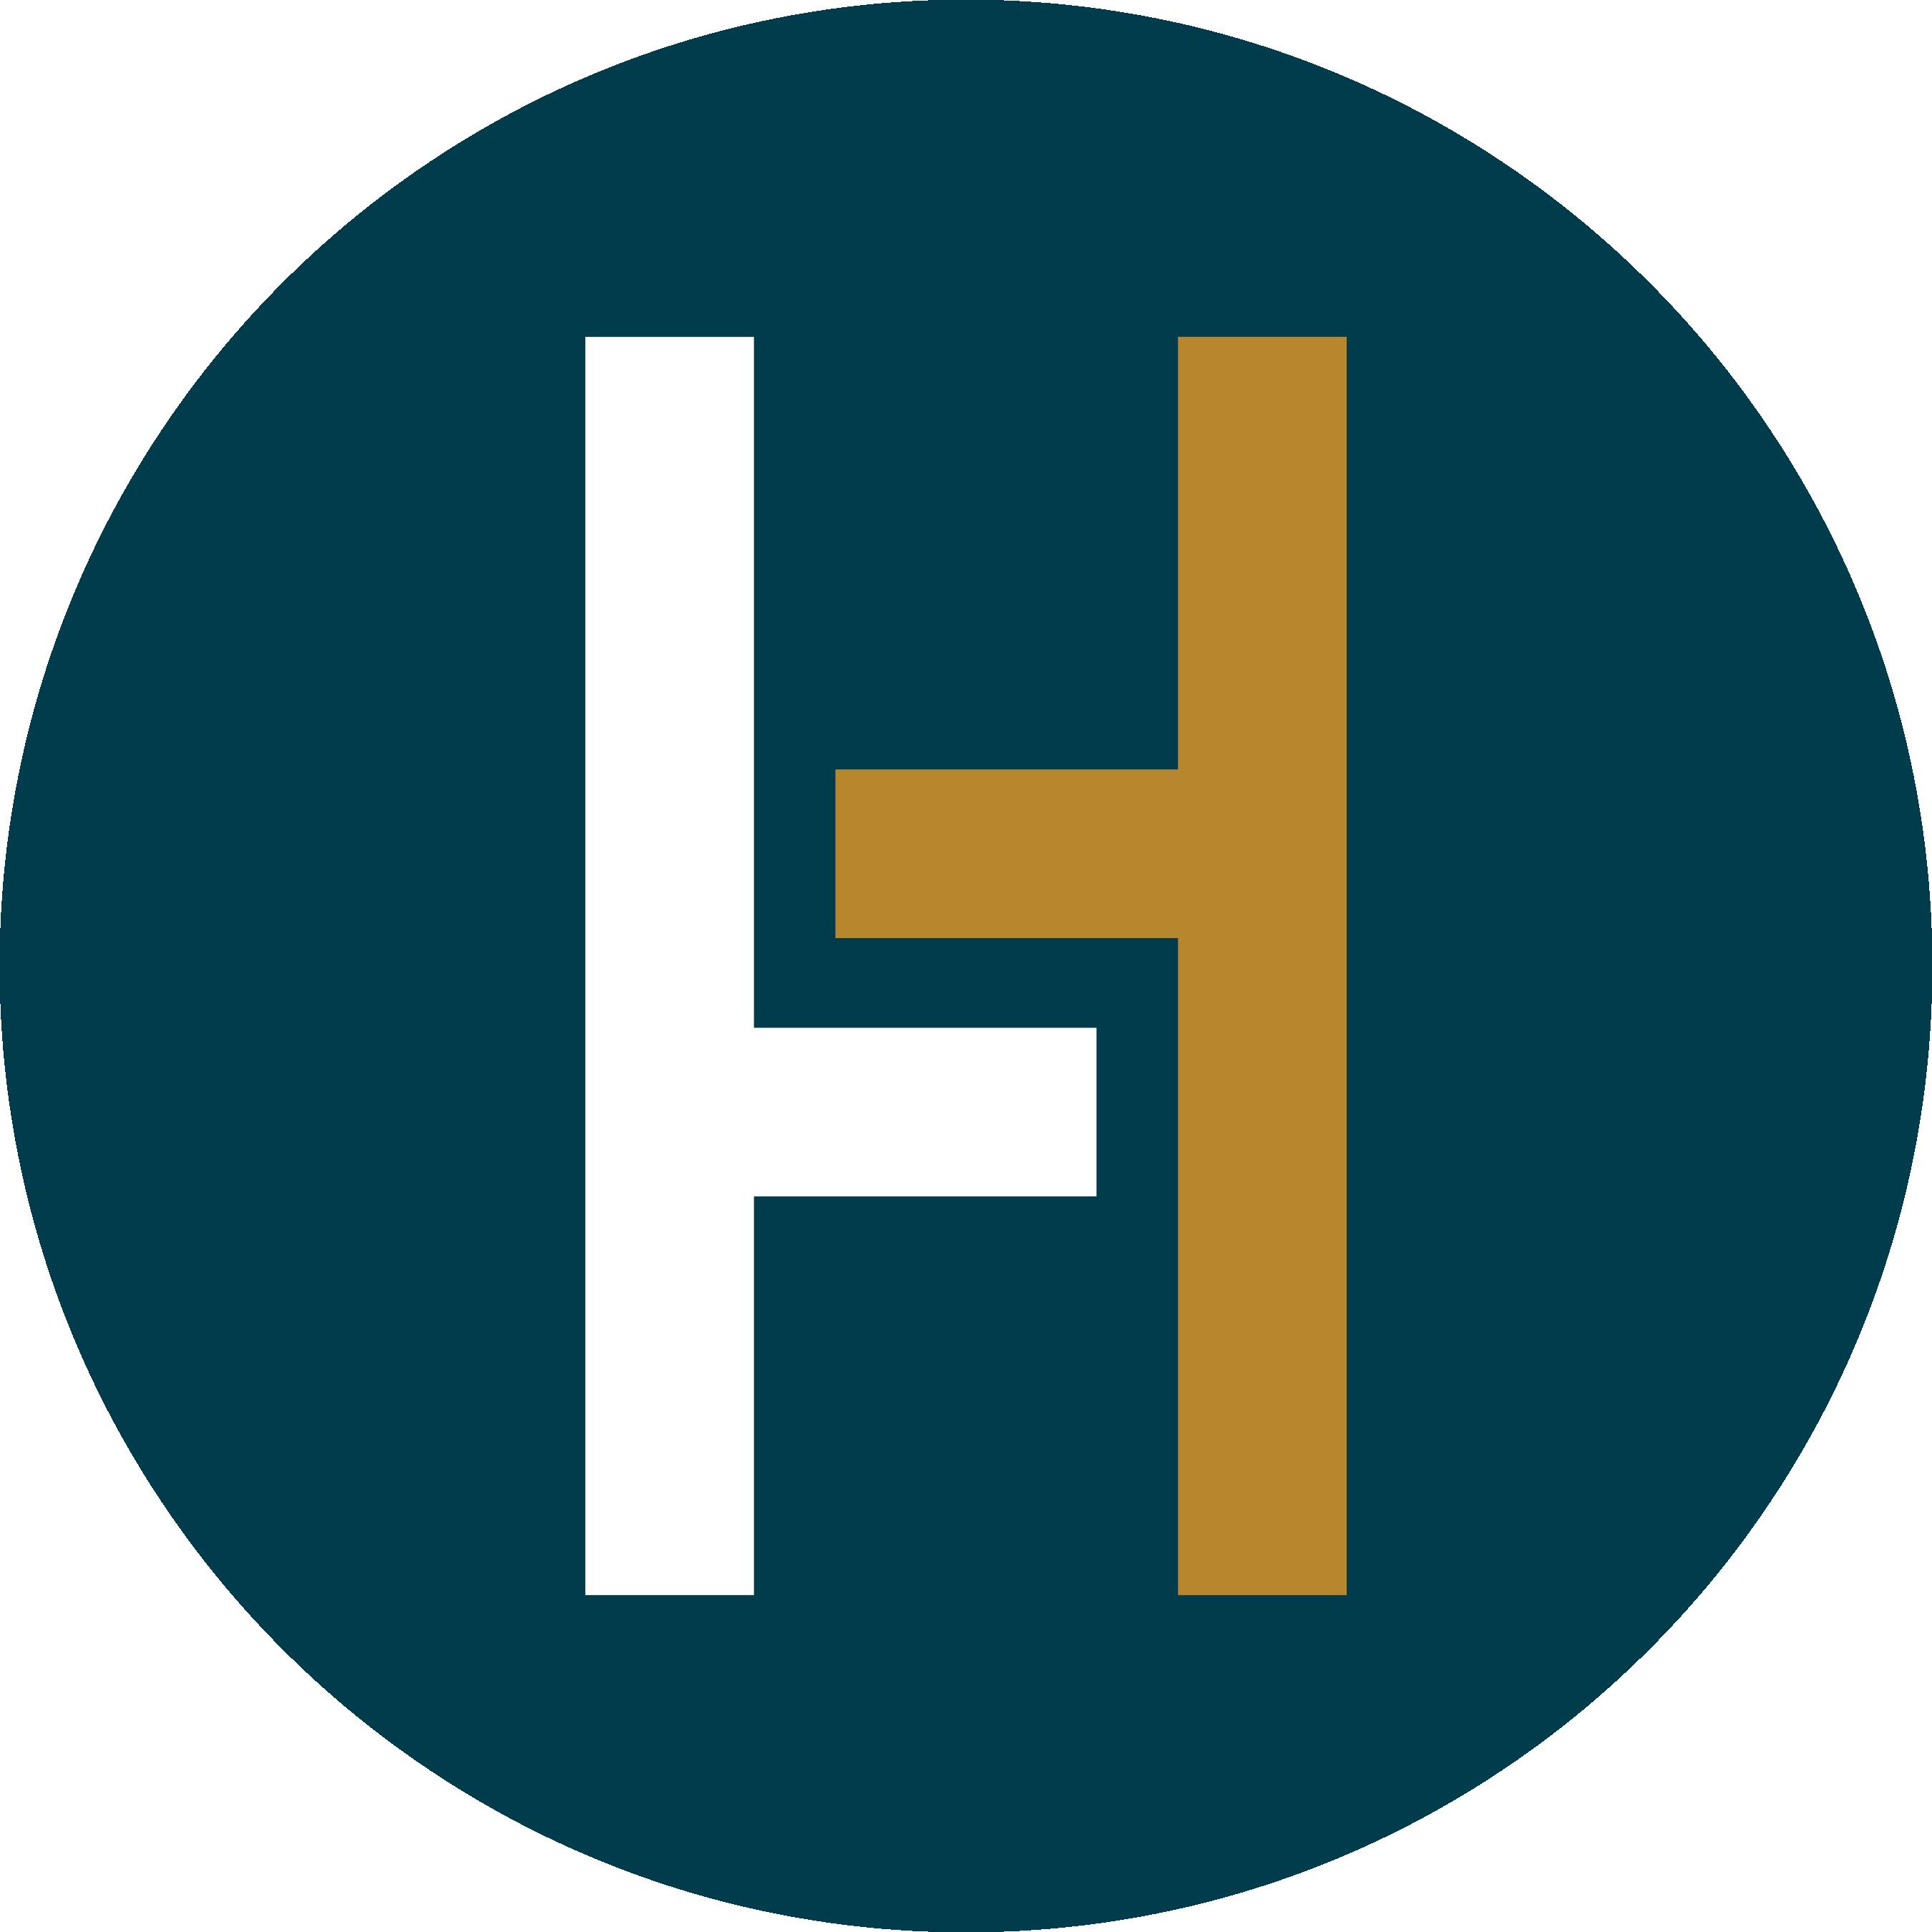 Digital Marketing Agency Portfolio | Logos design, Logos ...